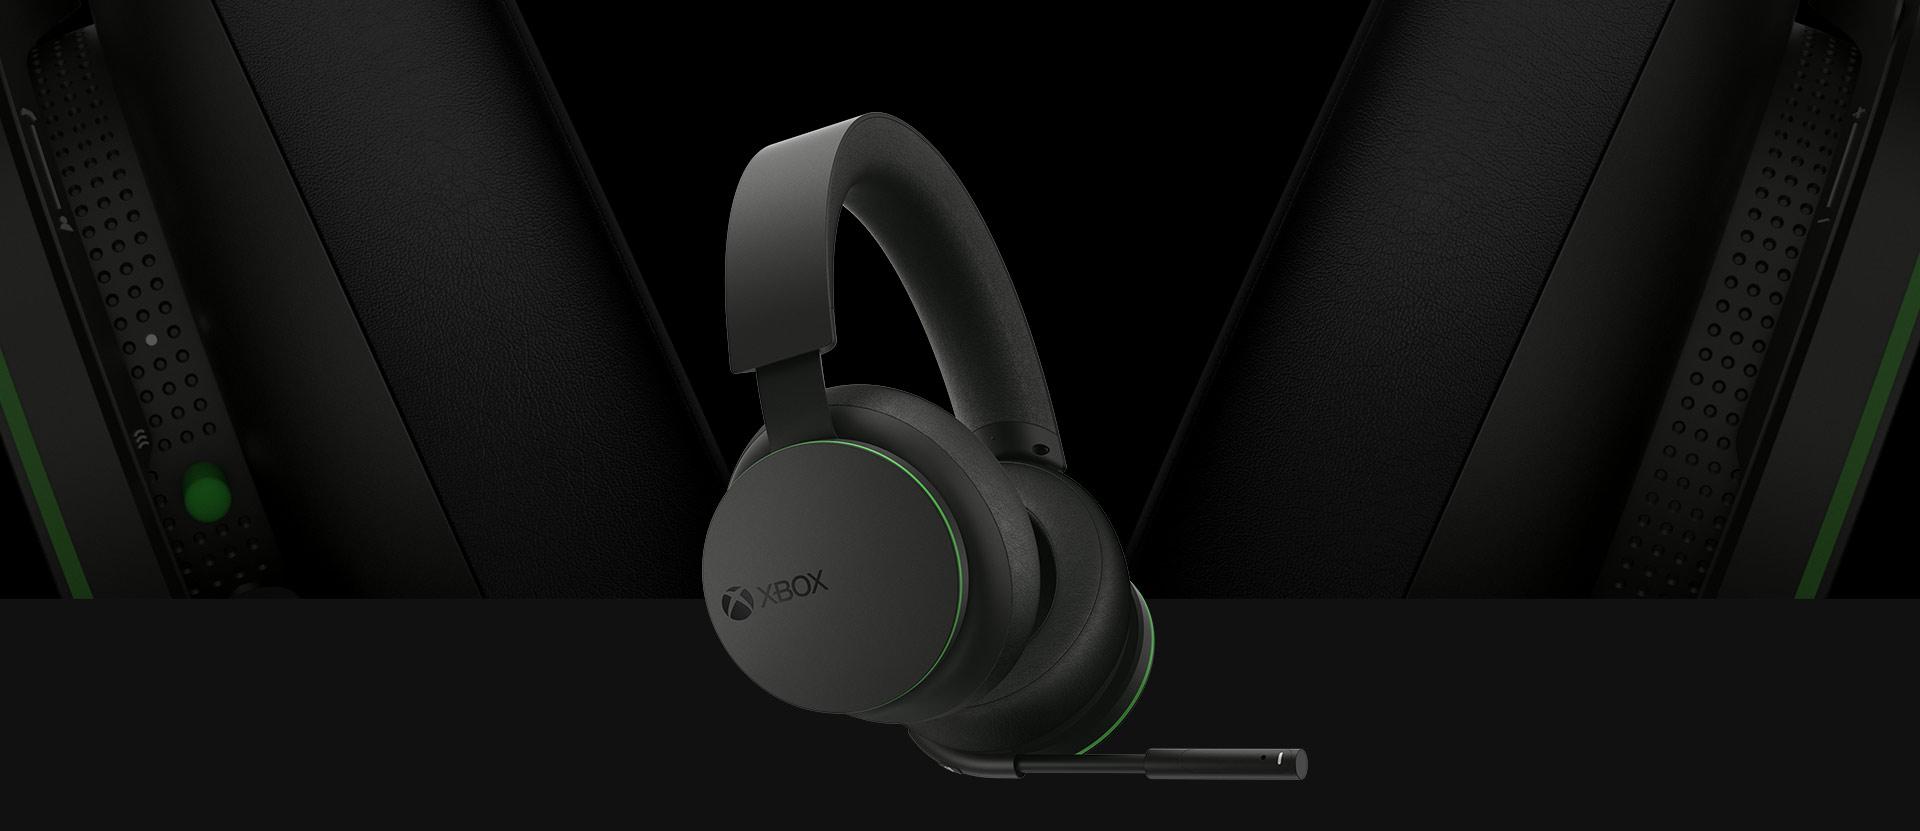 Xbox Wireless Headset - Immagine di copertina